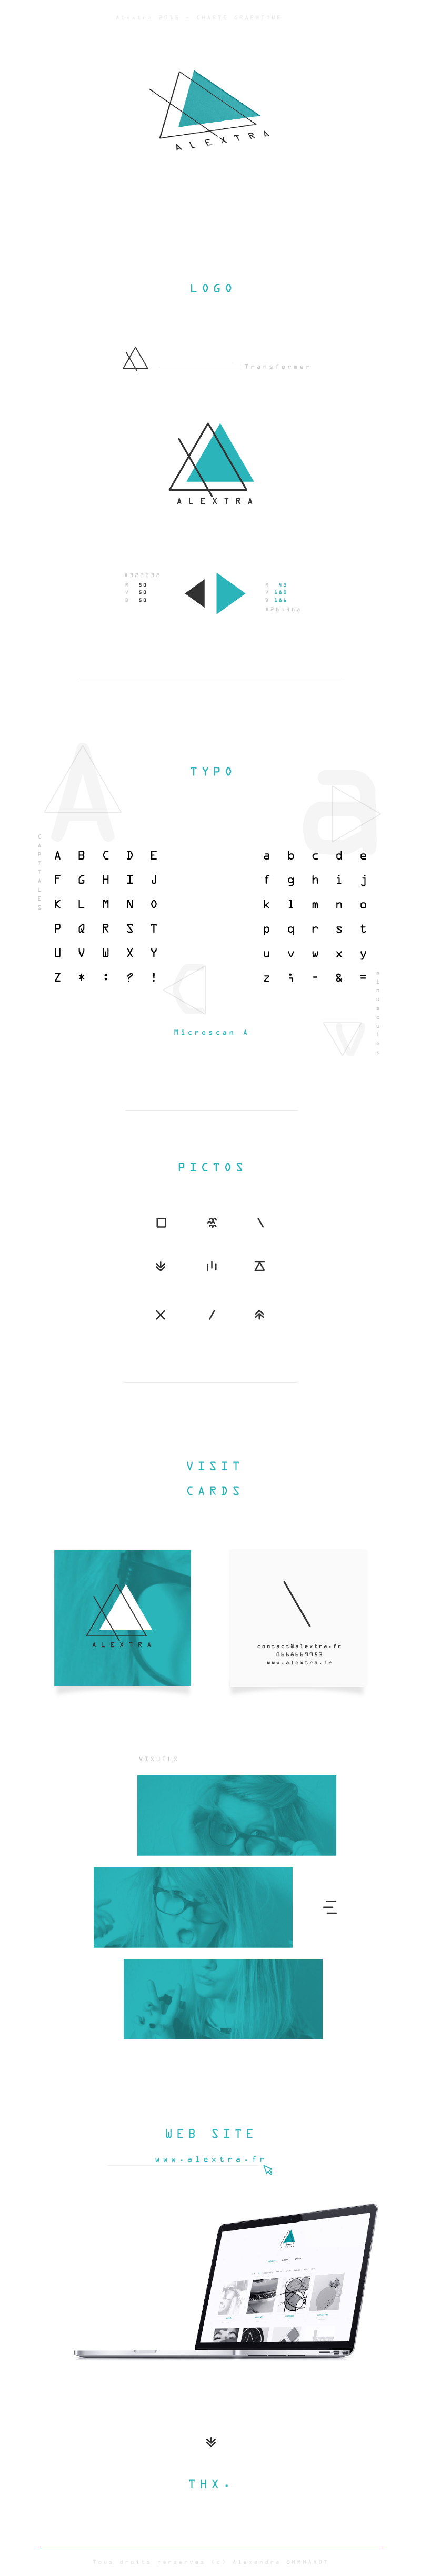 alextra    graphic designer grenoble